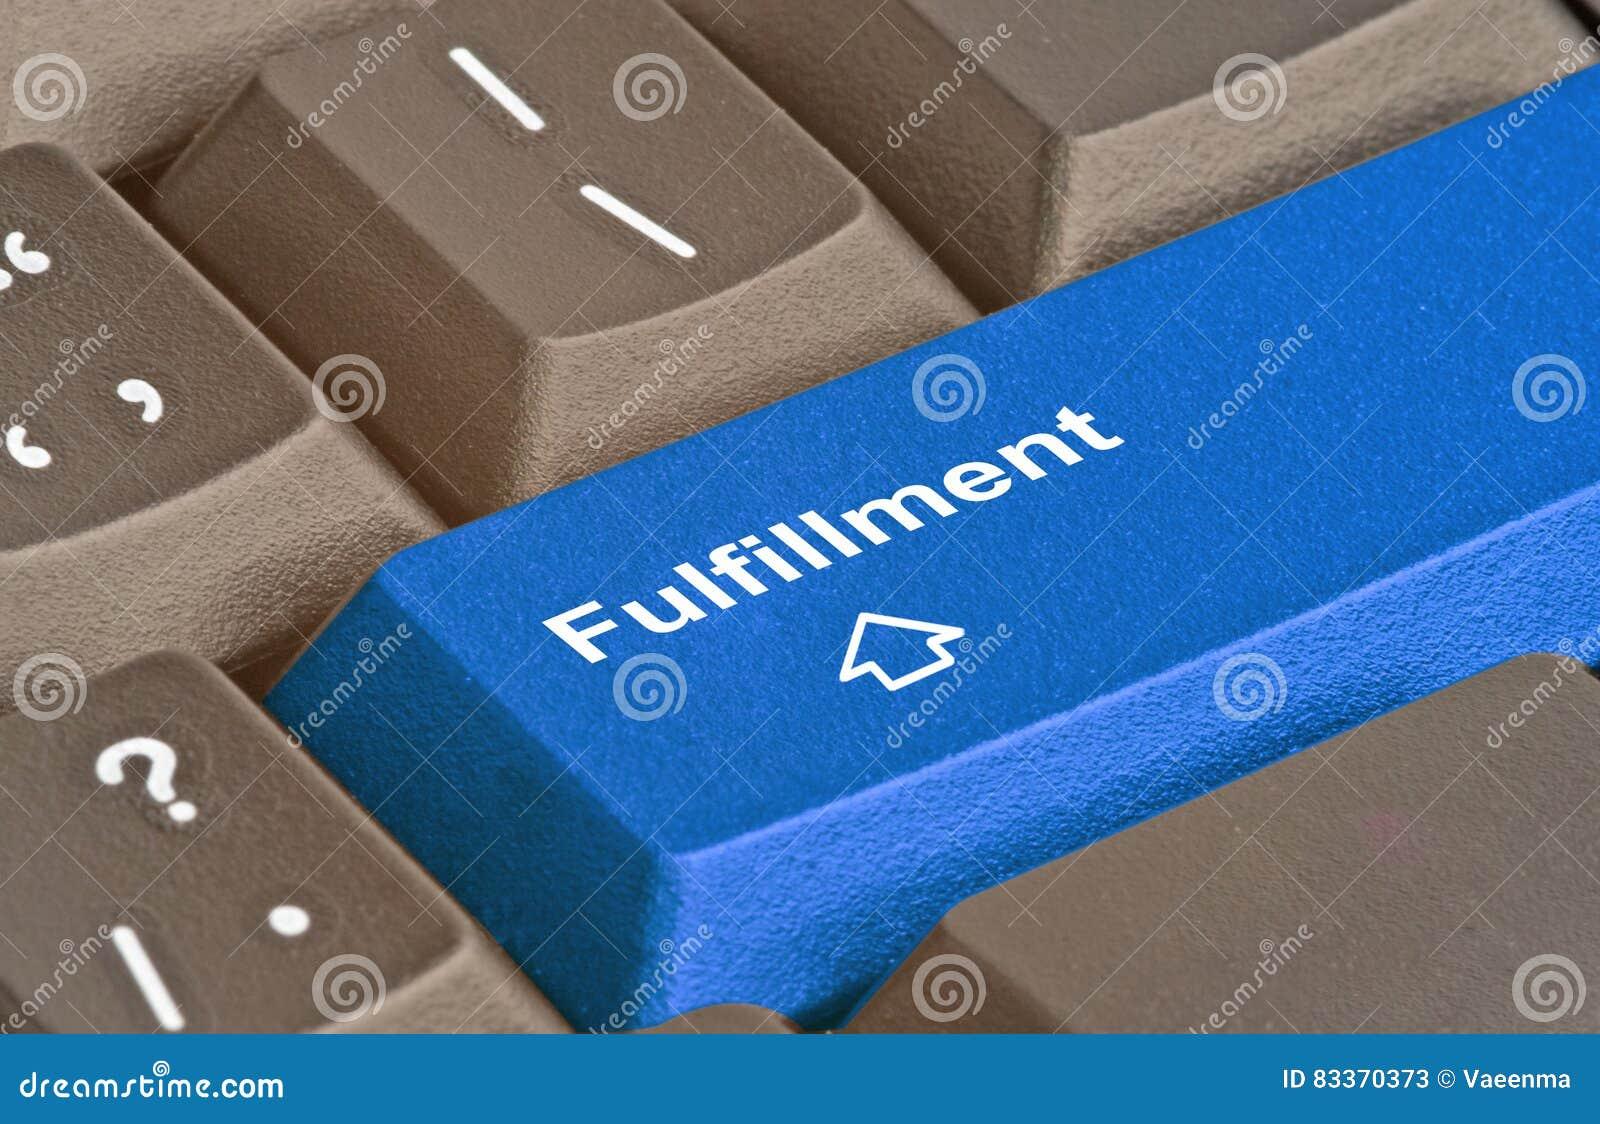 Hot key for fulfillment